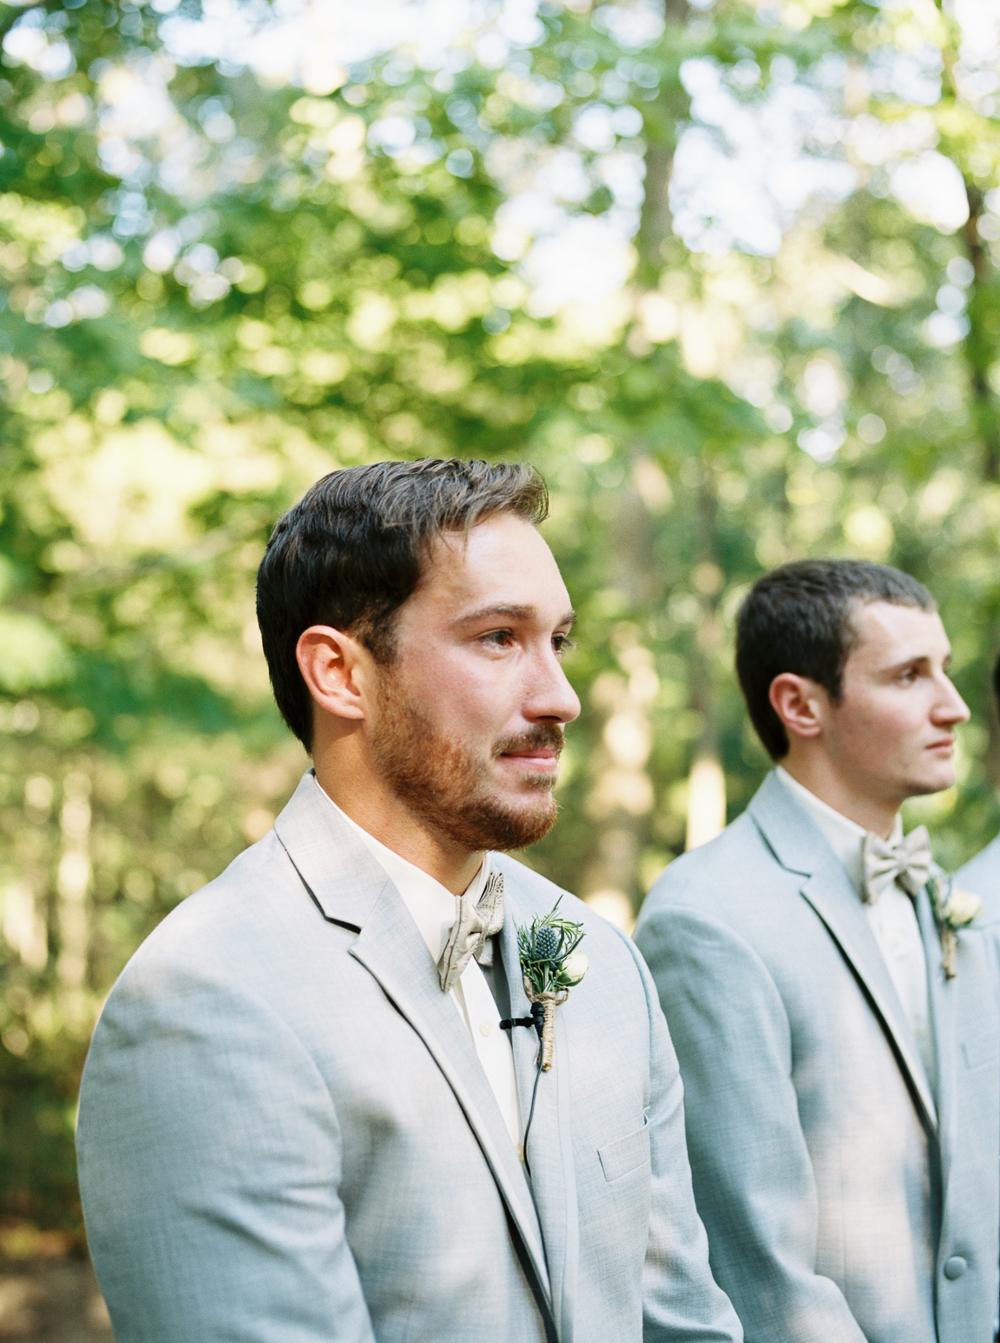 jamie+trey_wrens nest film wedding photographers natural light ©2016abigailbobophotography-21.jpg